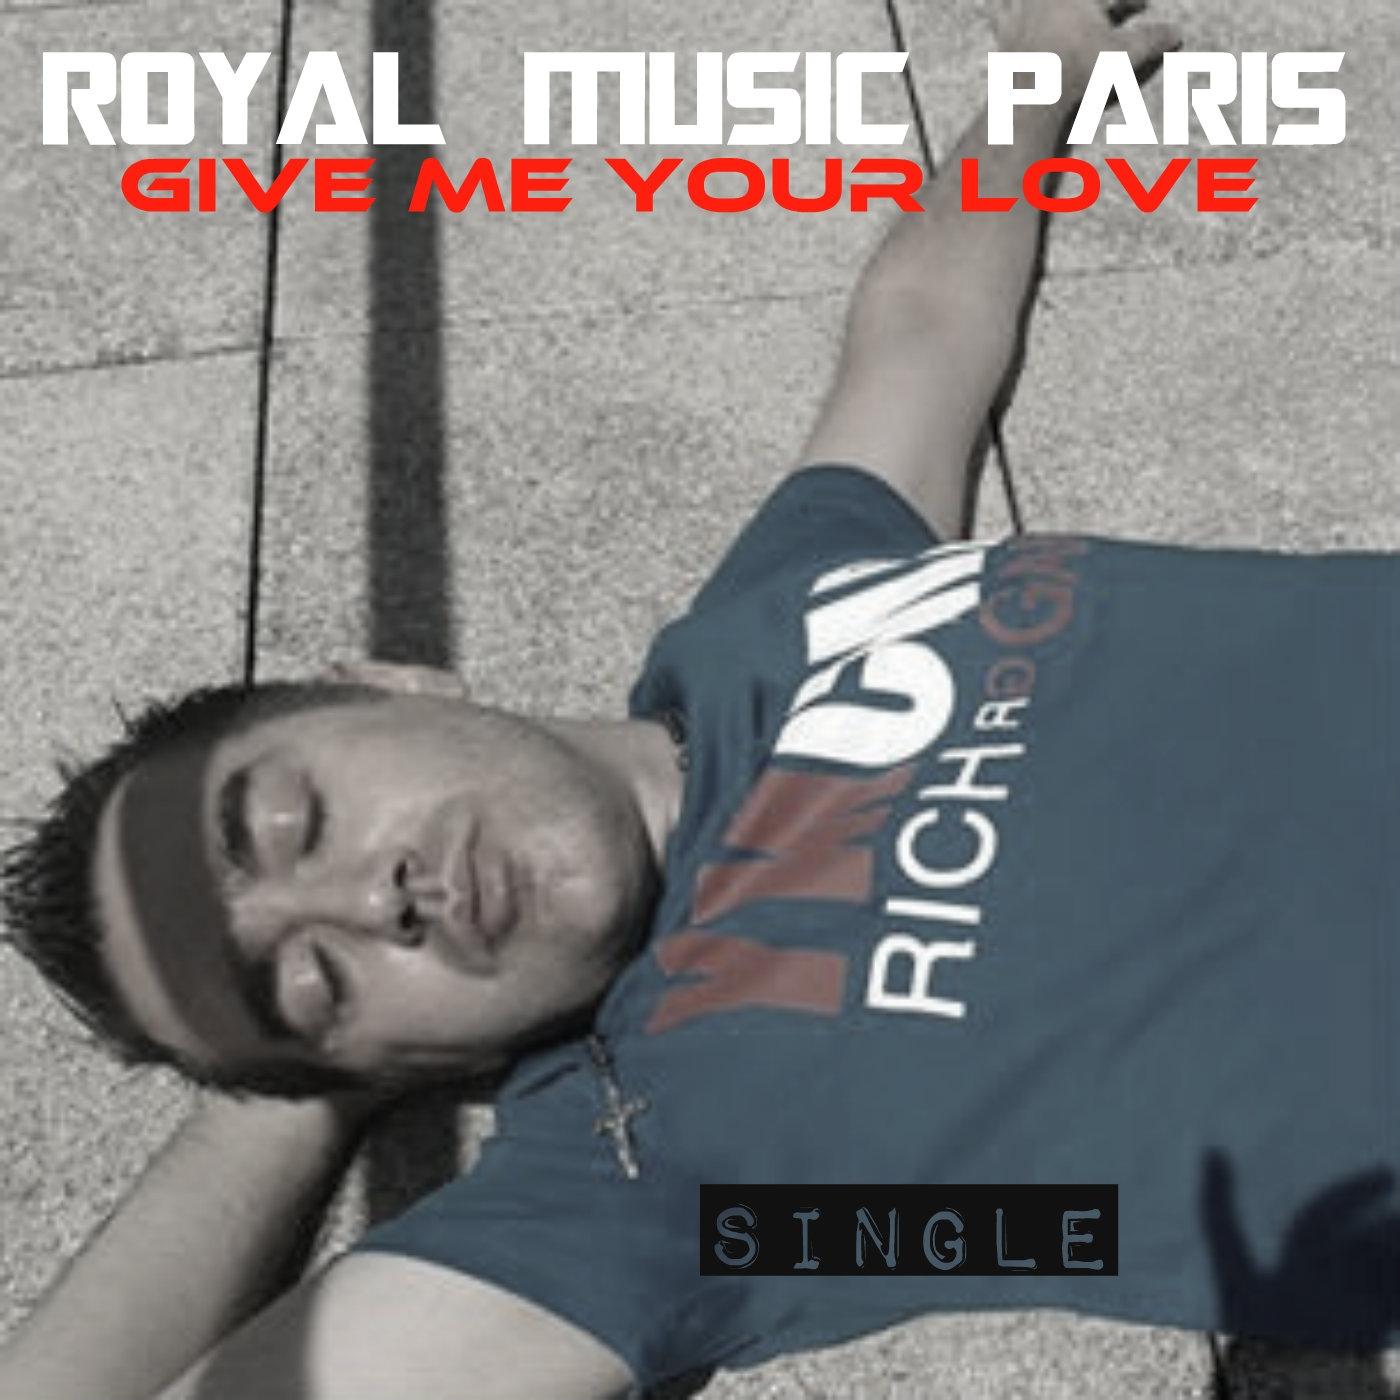 Royal Music Paris - Give Me Your Love (Club Mix)